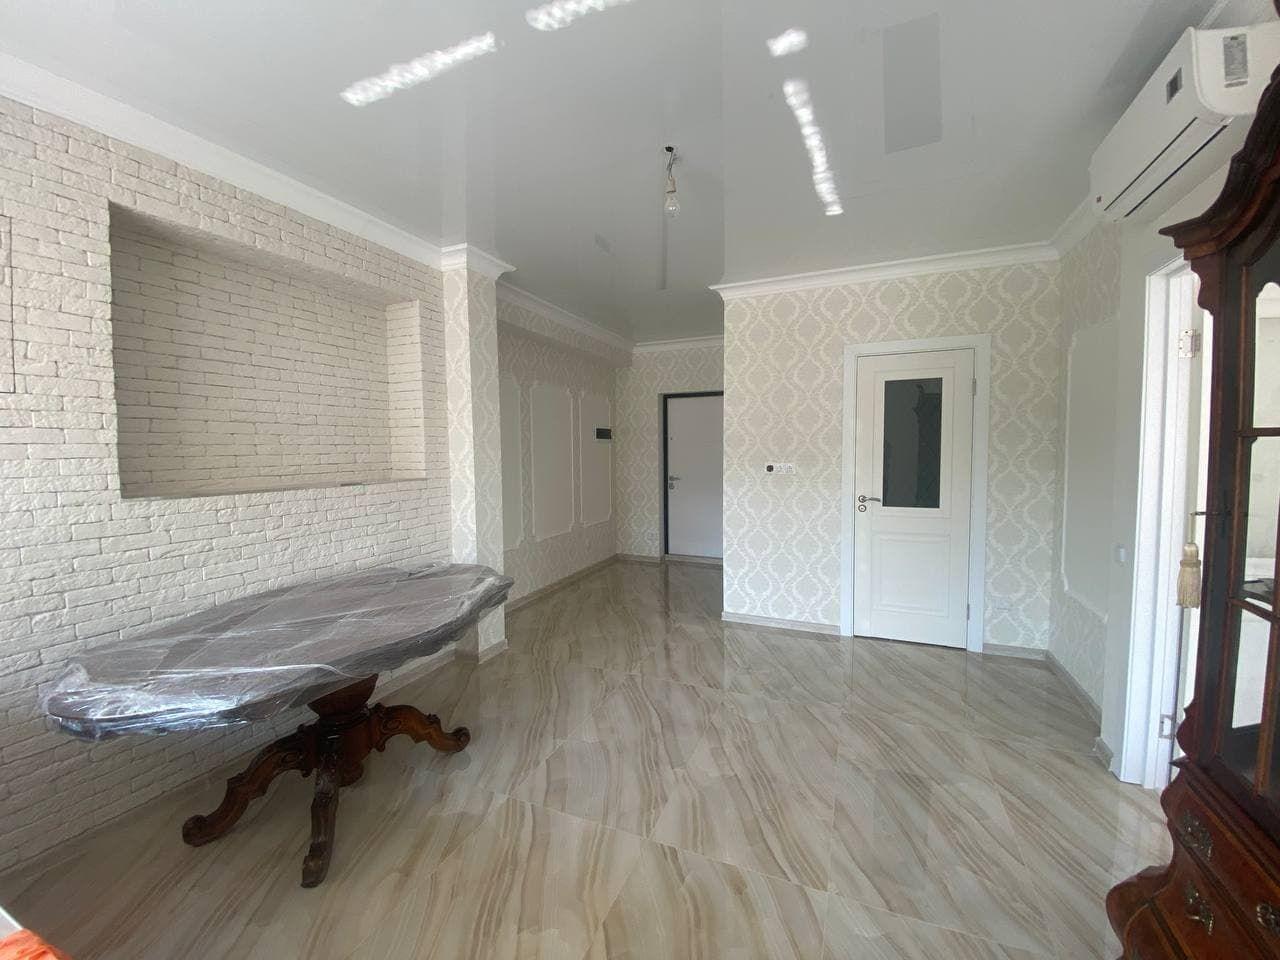 Apartament modern 1 cameră+ living mobilat reparat str. Vorniceni, Botanica